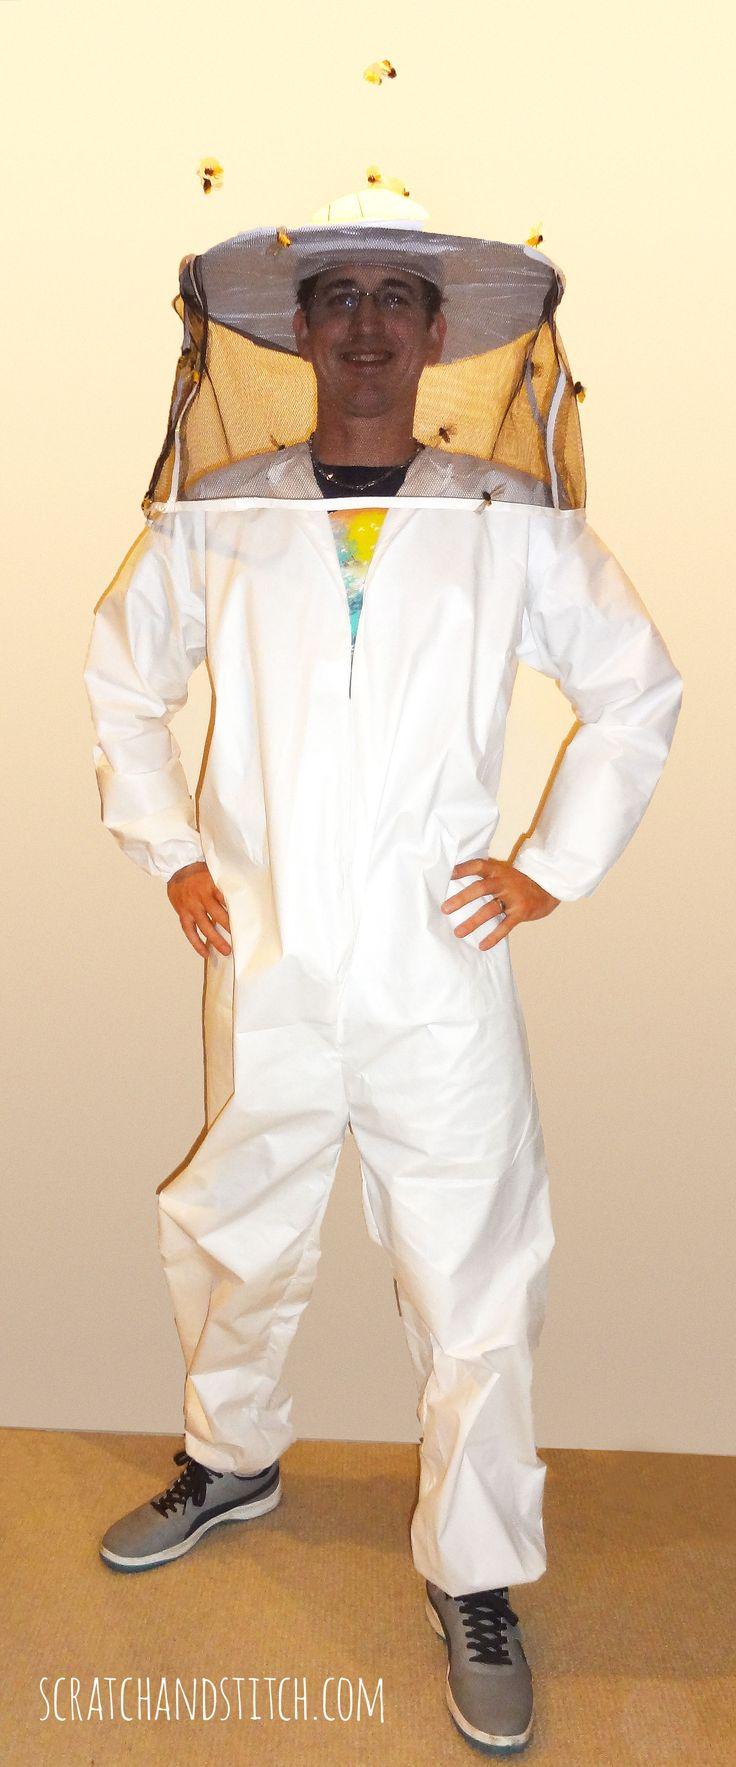 DIY Beekeeper Costume - scratchandstitch.com